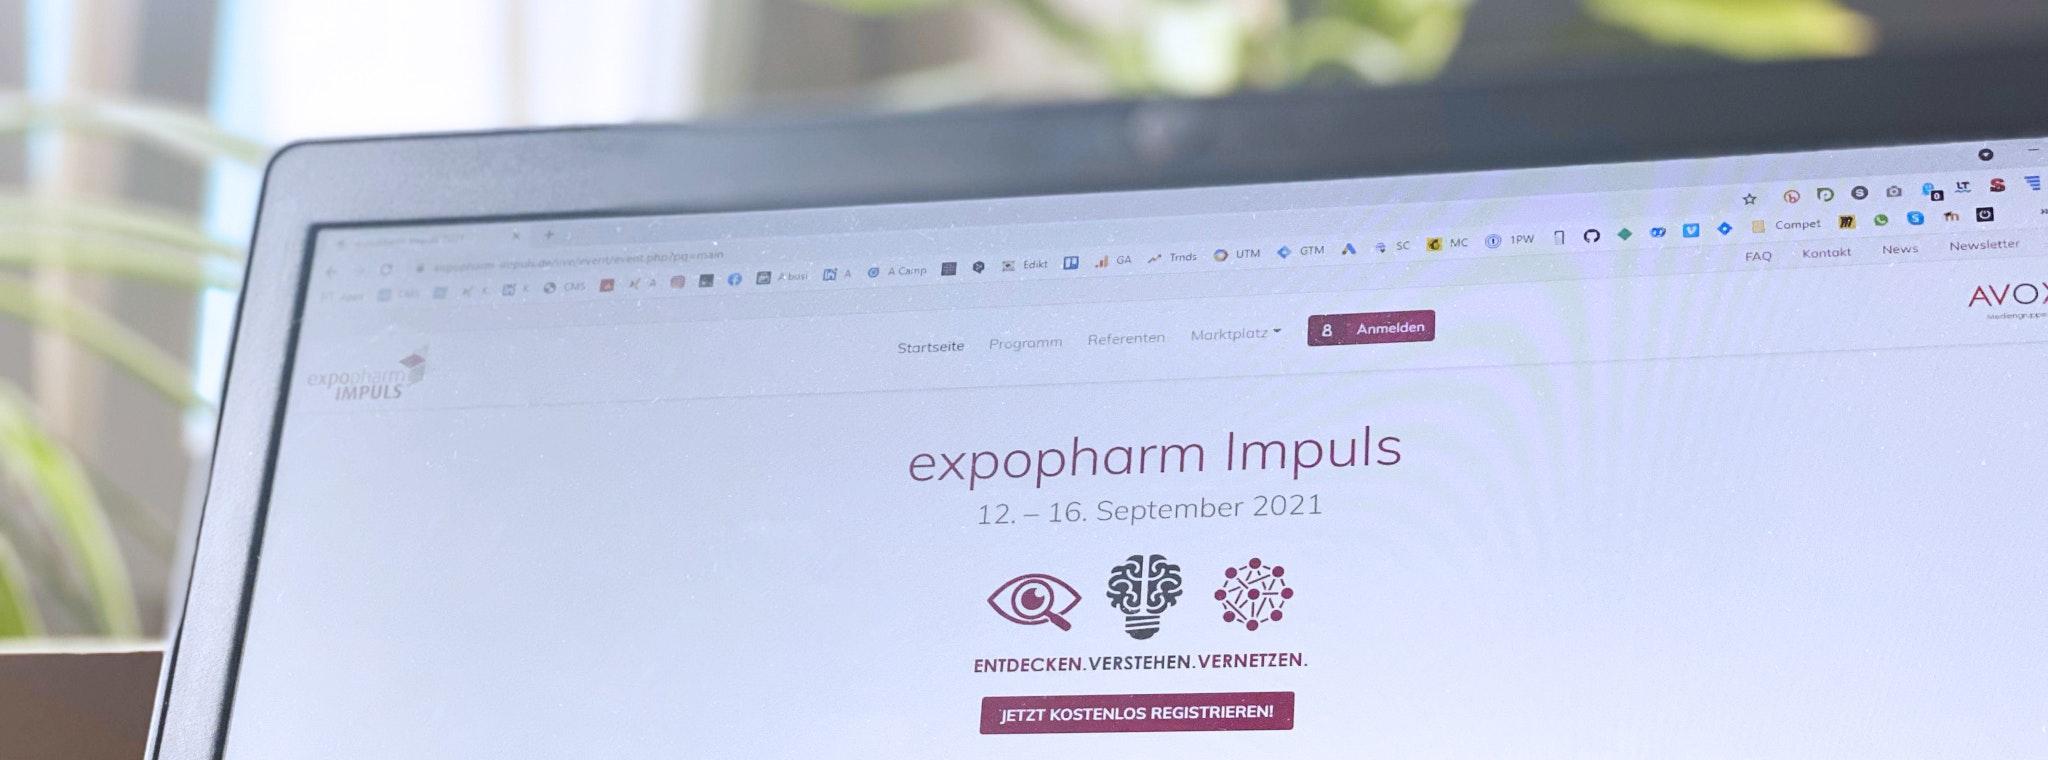 Knapp Smart Solutions Apostore Digitale Apotheke Automation expopharm Impuls2021 Screen Laptop 2